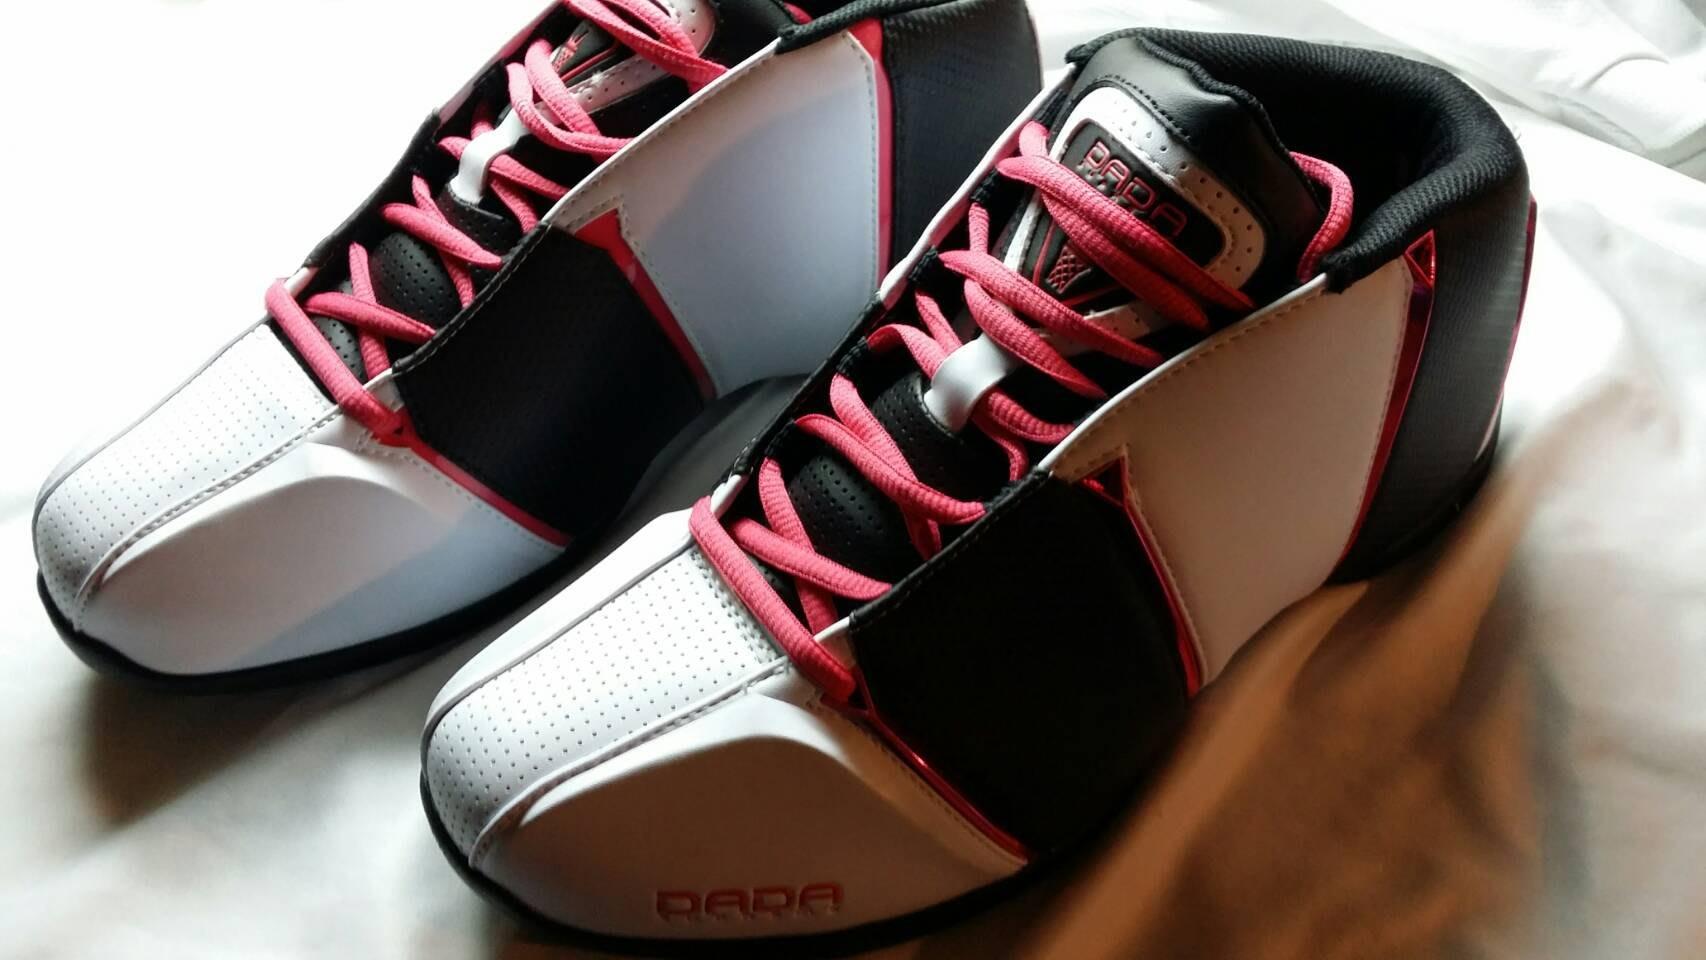 DADA 籃球鞋 4th quarter US 9.5 27.5 cm 白 黑 粉紅 NIKE 參考